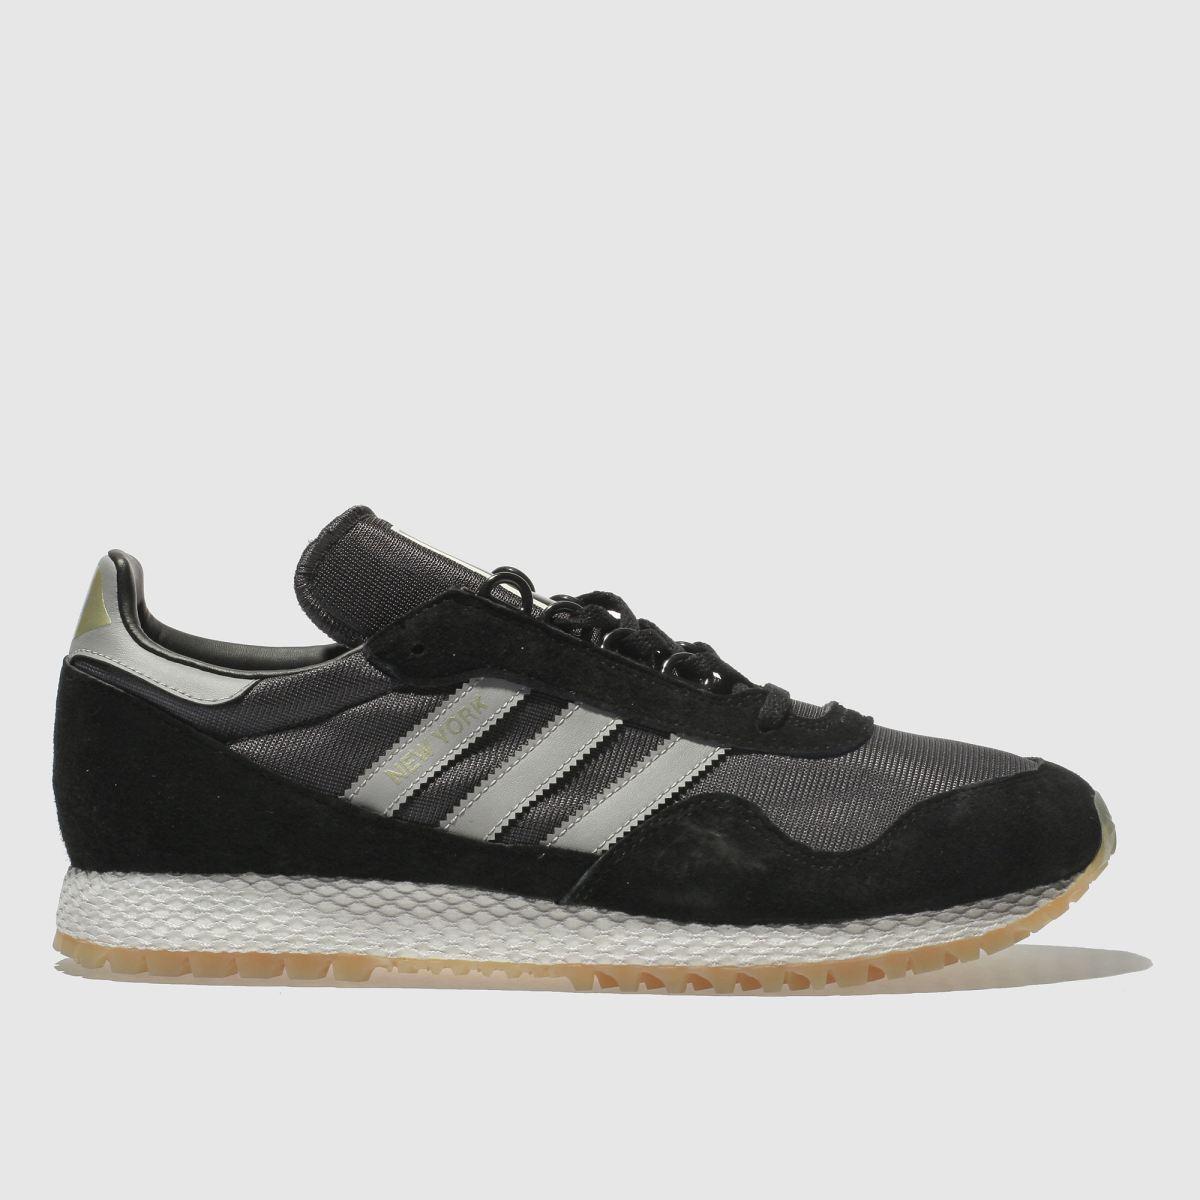 Adidas Black & Grey New York Trainers